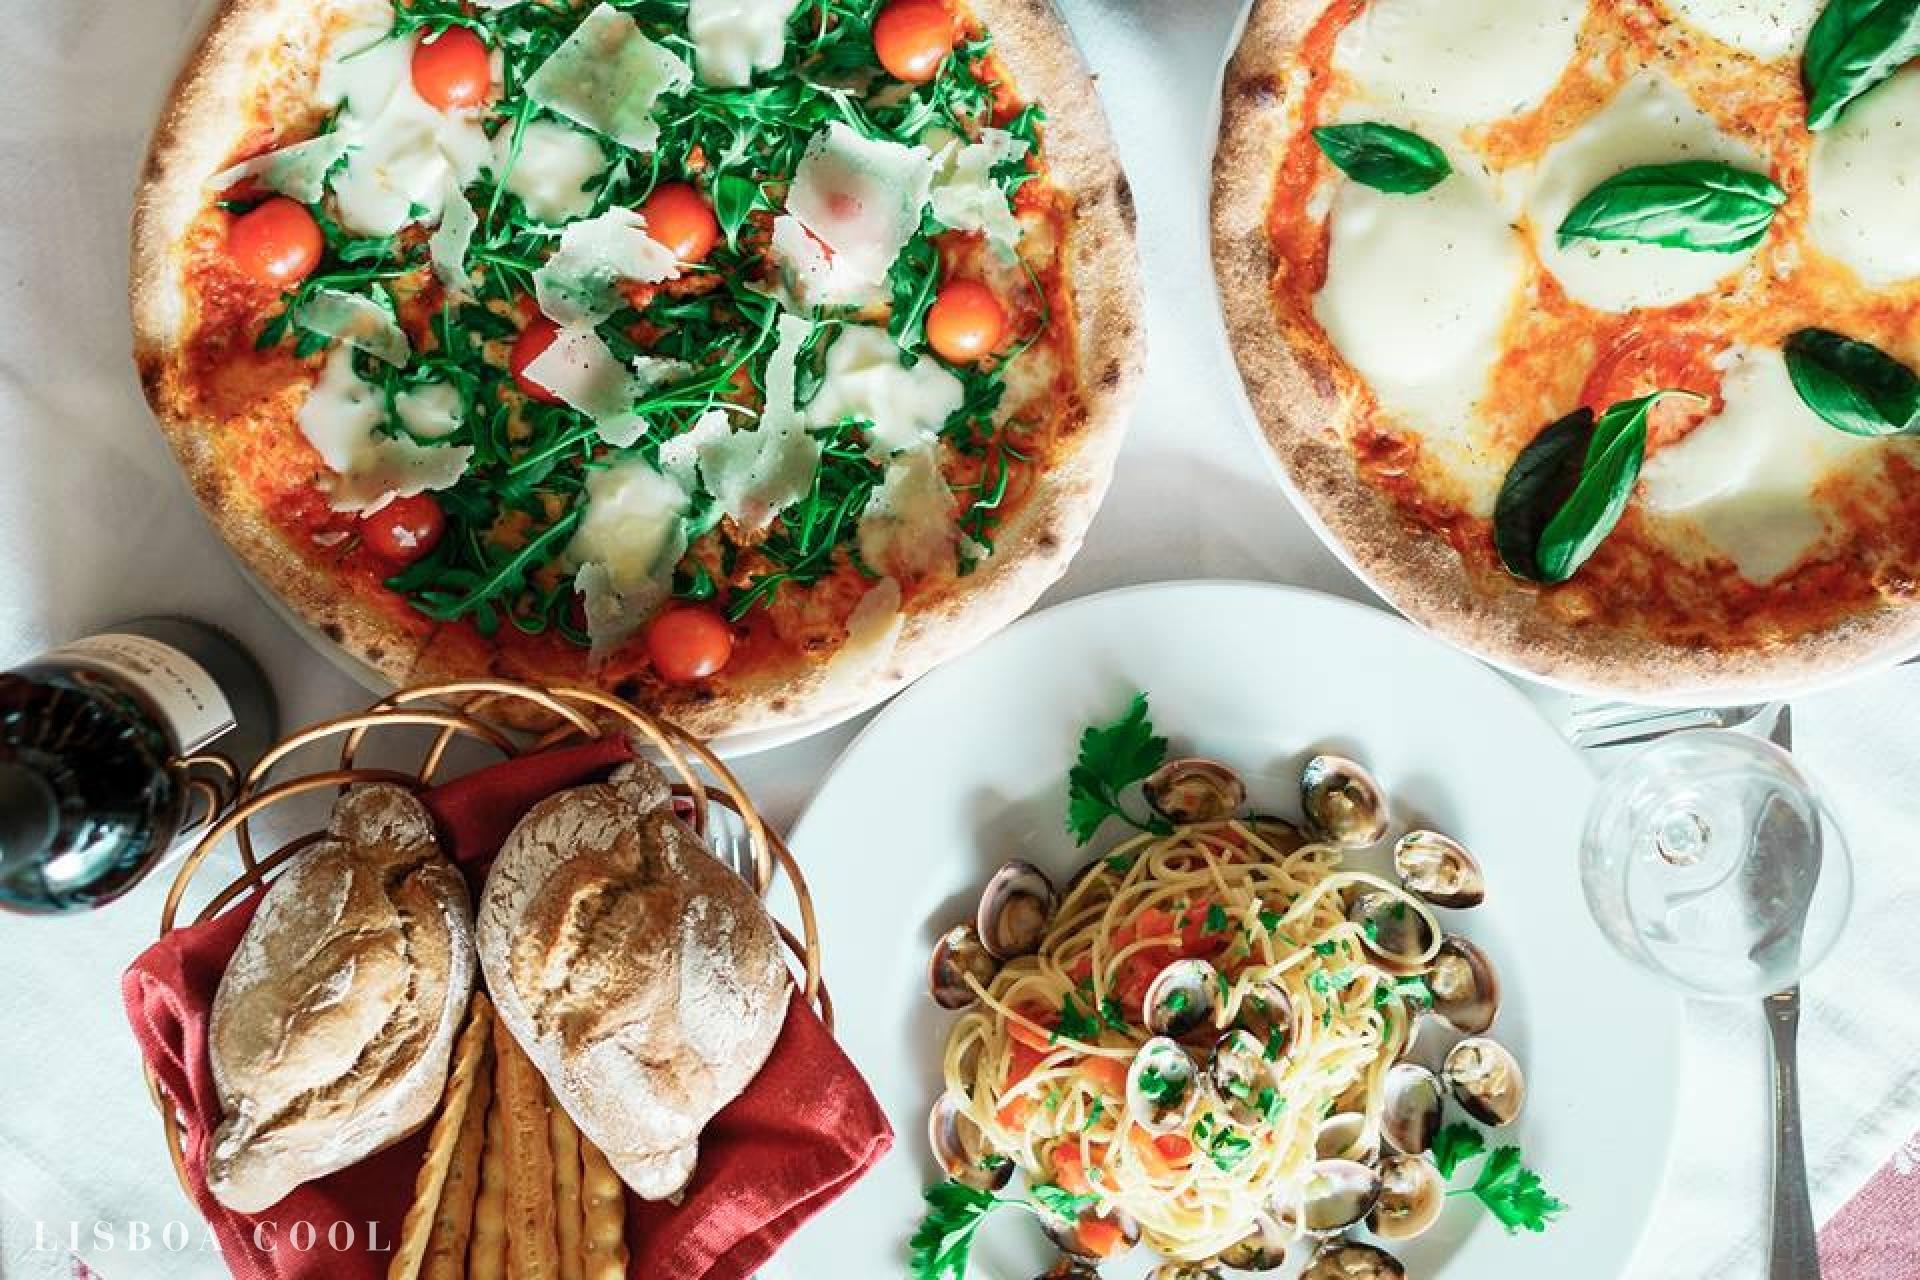 LisboaCool_Blog_Pizza ilimitada por 11€? Sim!